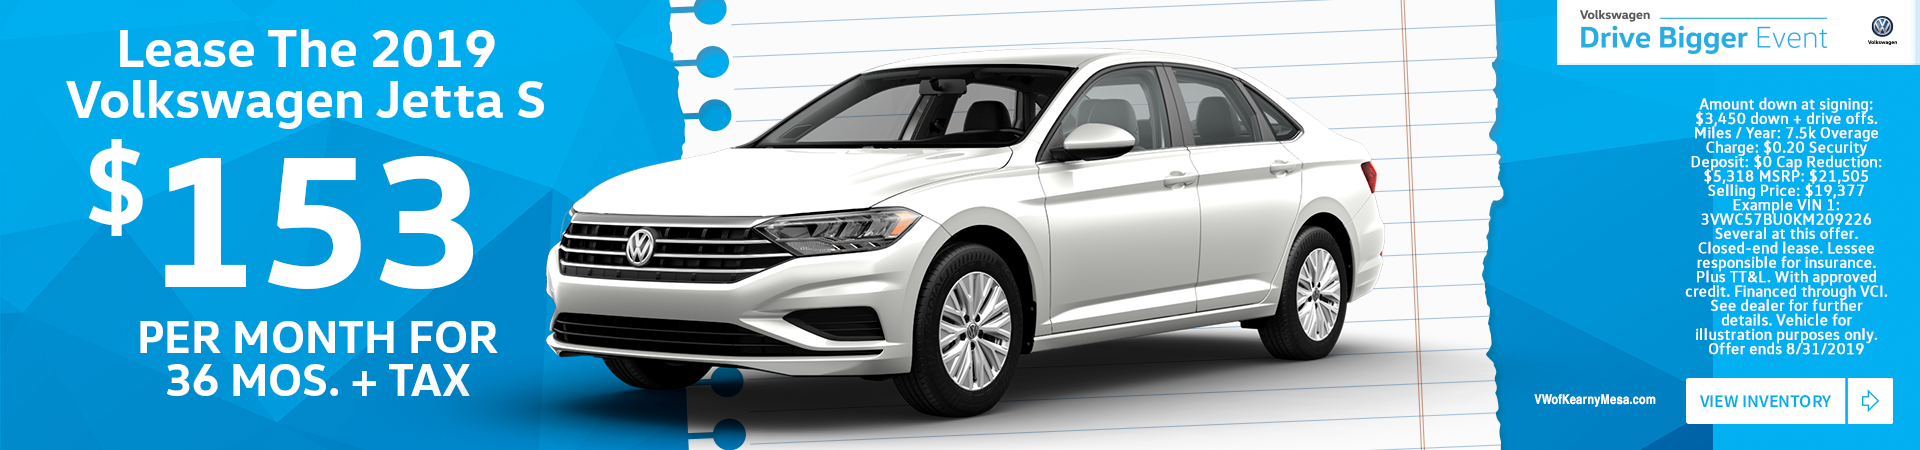 Kearny Mesa Vw >> Volkswagen Of Kearny Mesa Car Dealership Serving San Diego